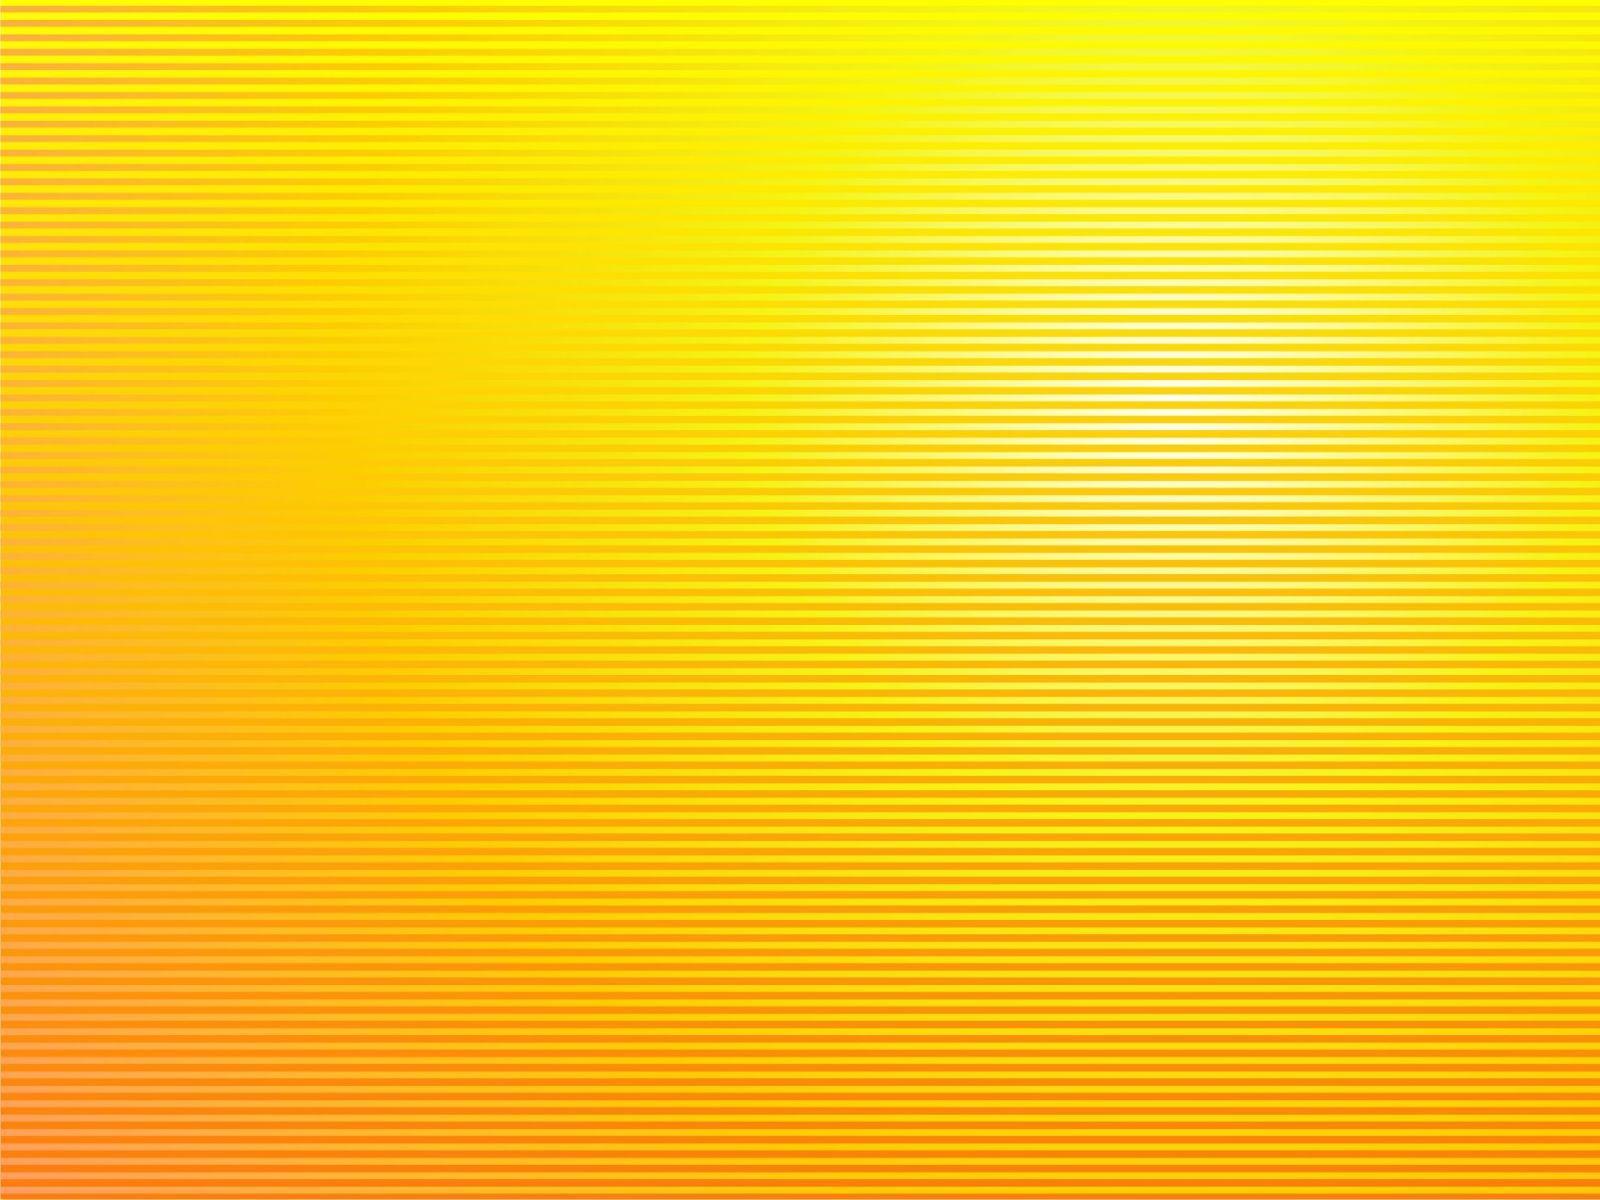 yellow hd wallpaper wallpapers for desktop pinterest hd